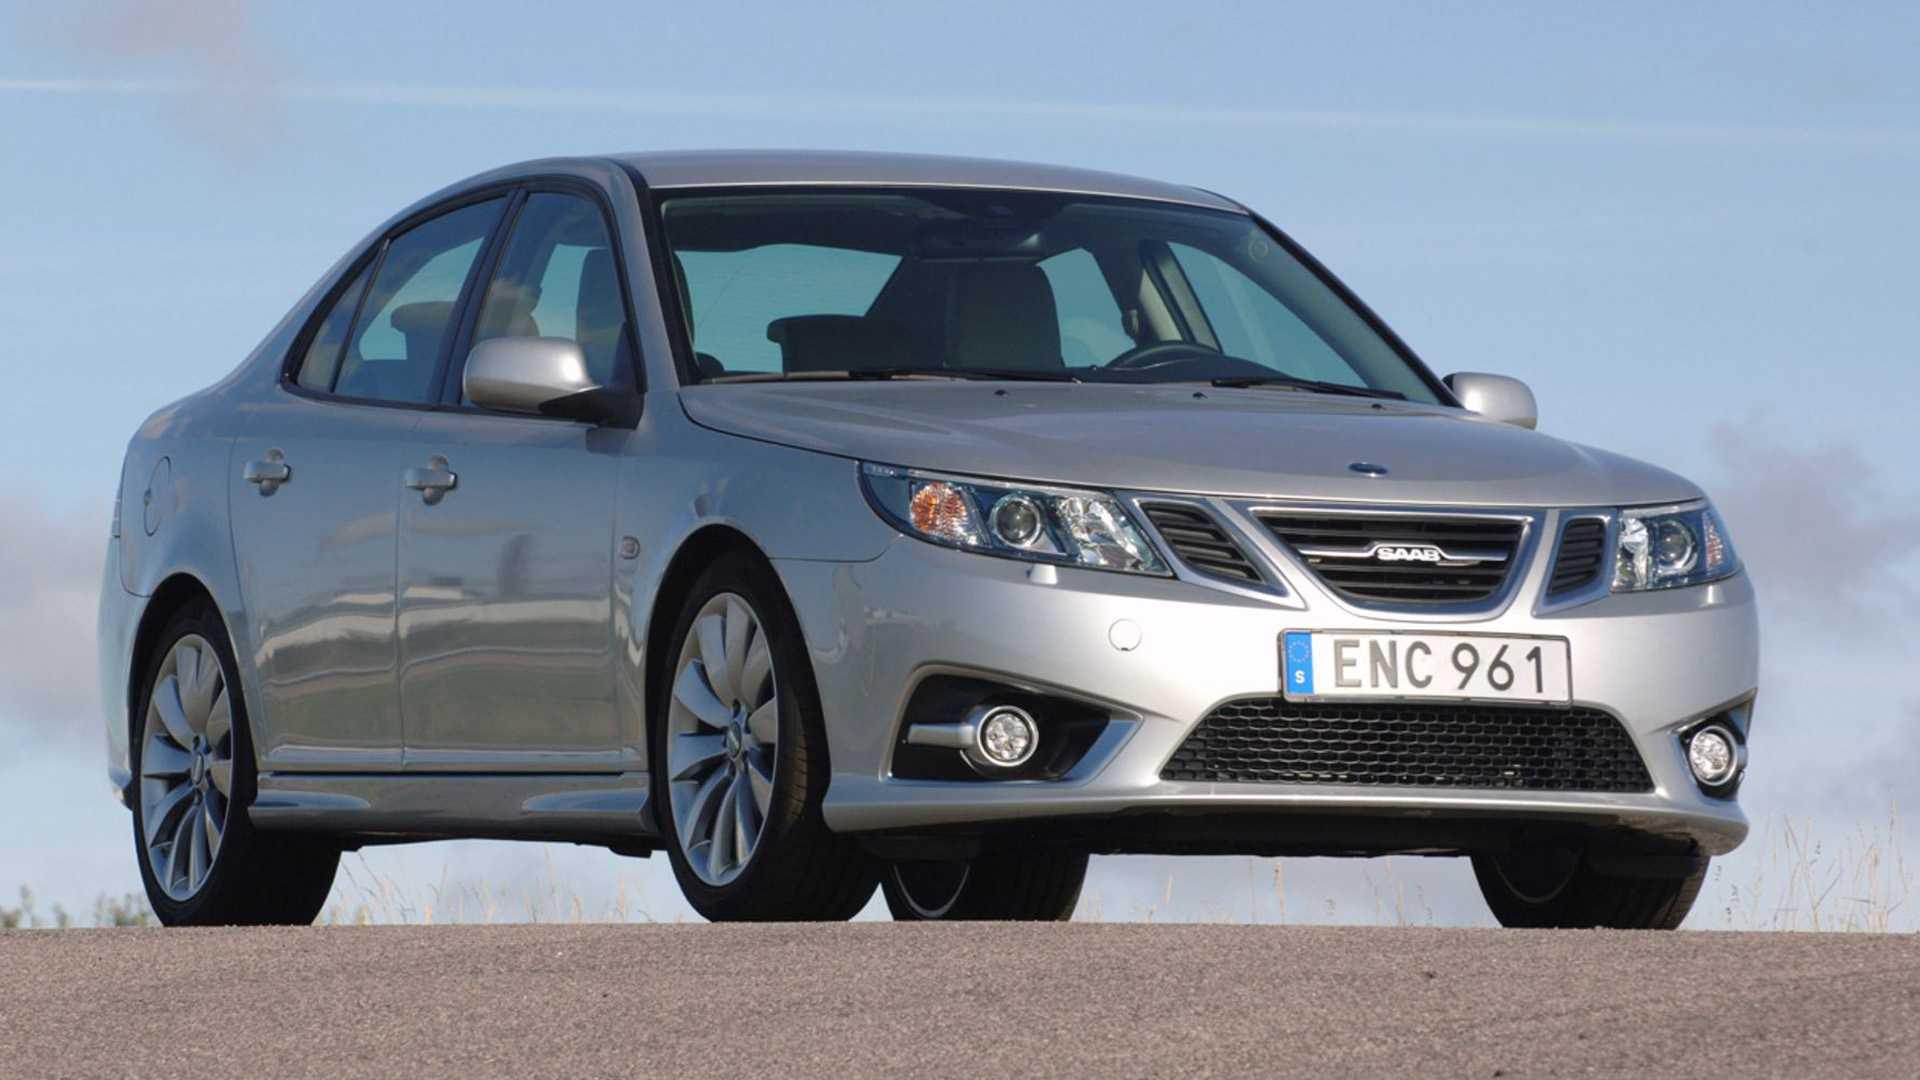 Последний Saab в истории продали на аукционе 1